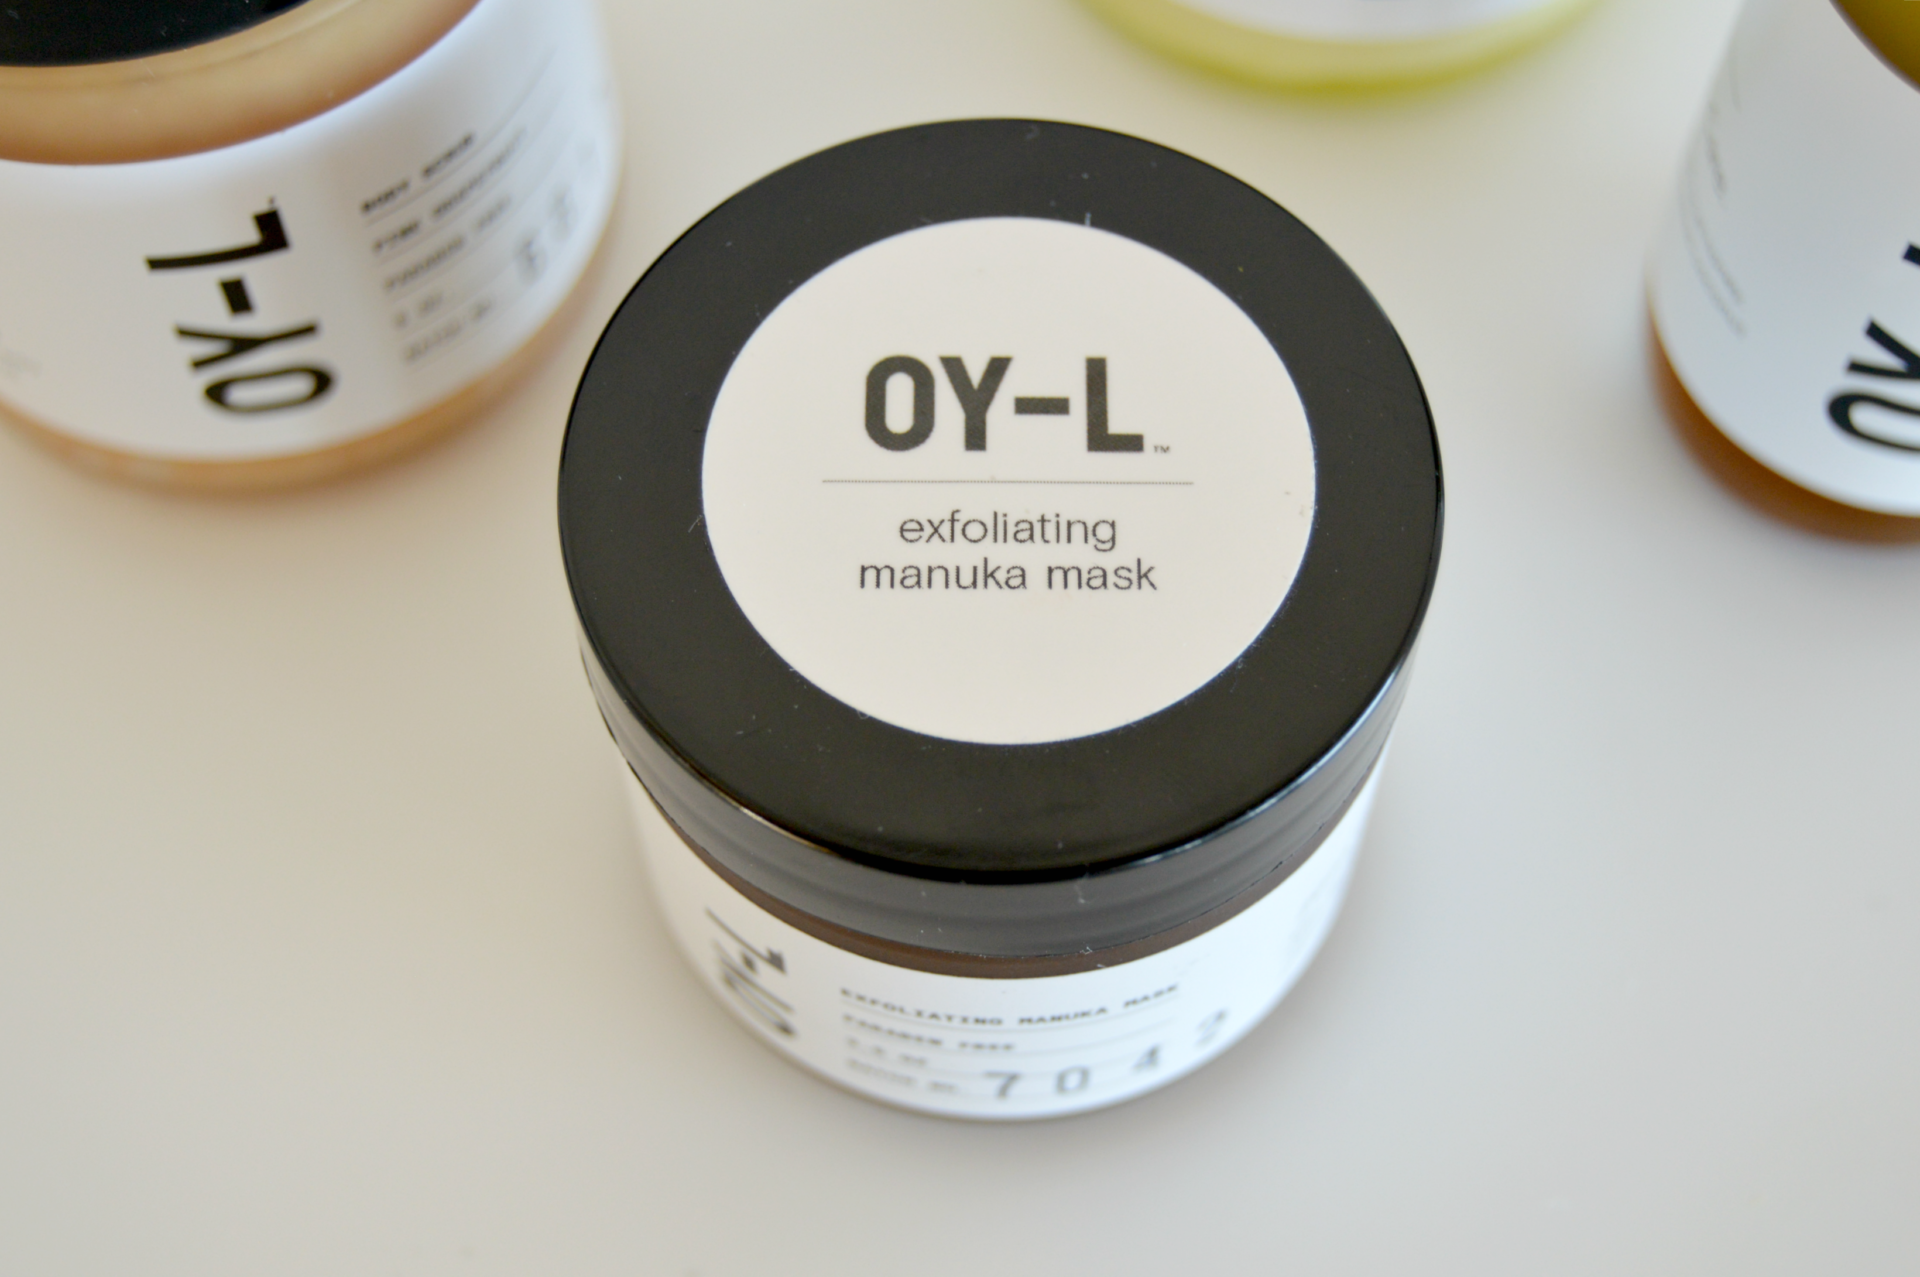 oy-l-manuka-mask-review-inhautepursuit